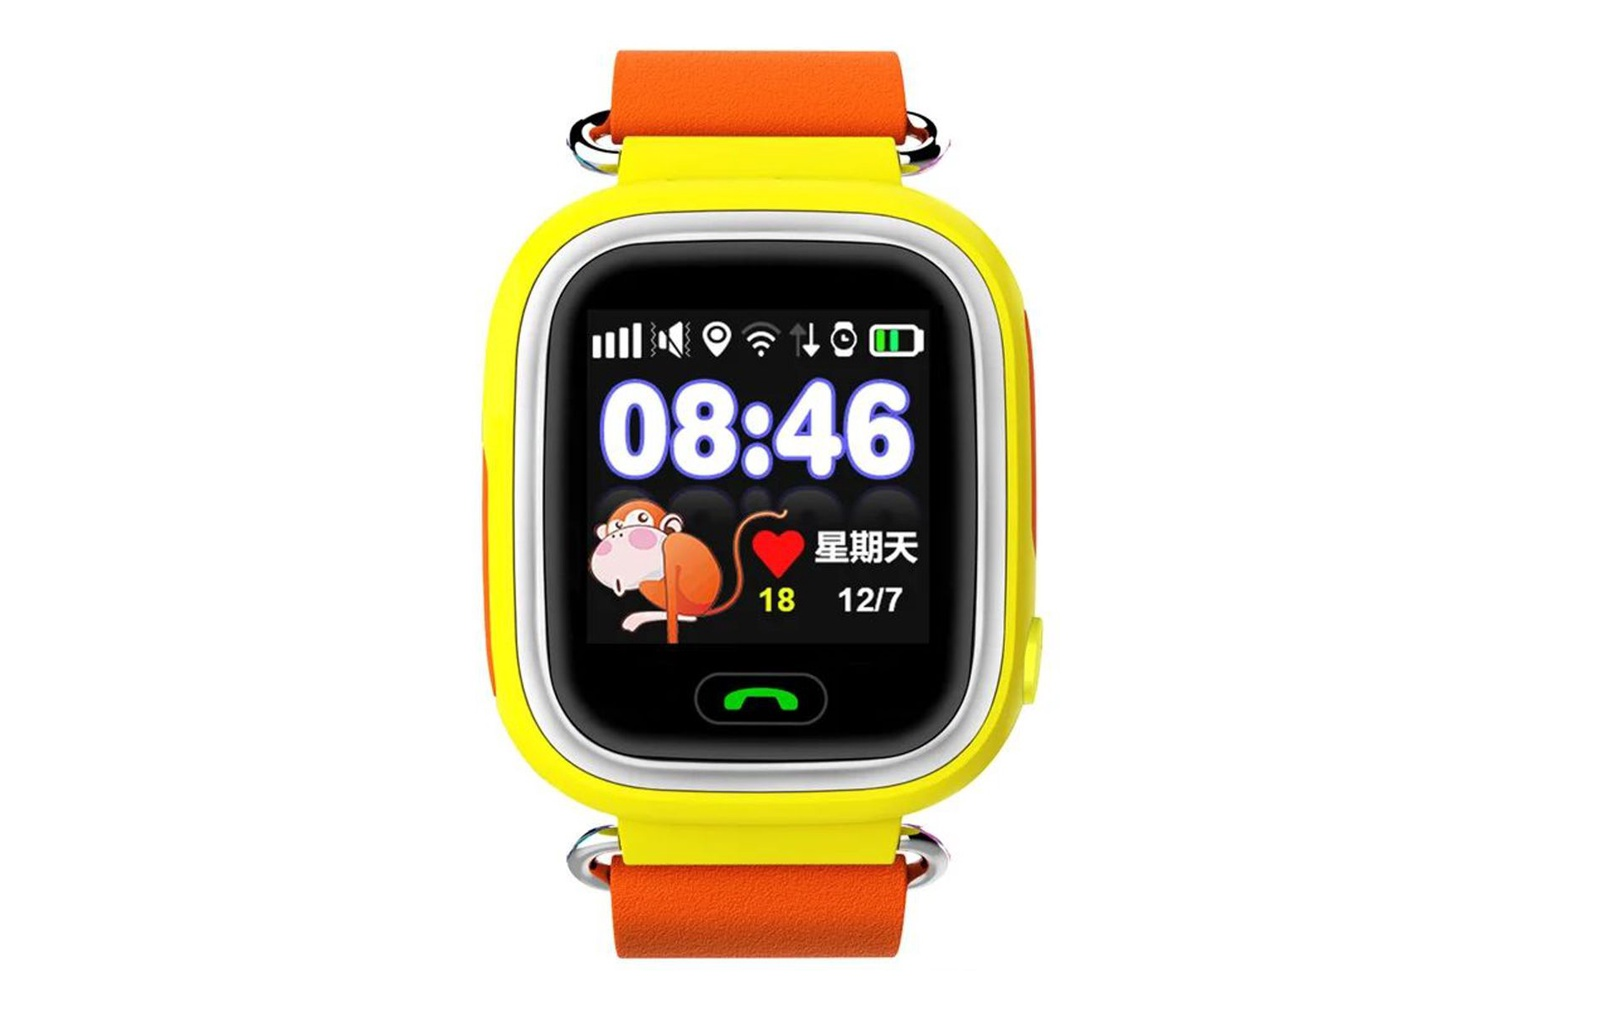 Часы Smart Baby Watch Q90 с сенсорным экраном - оранжевый q100 q750 smart watch phone baby children kids gps tracker 1 54 touch screen wifi location sos anti lost device safe pk q50 q90